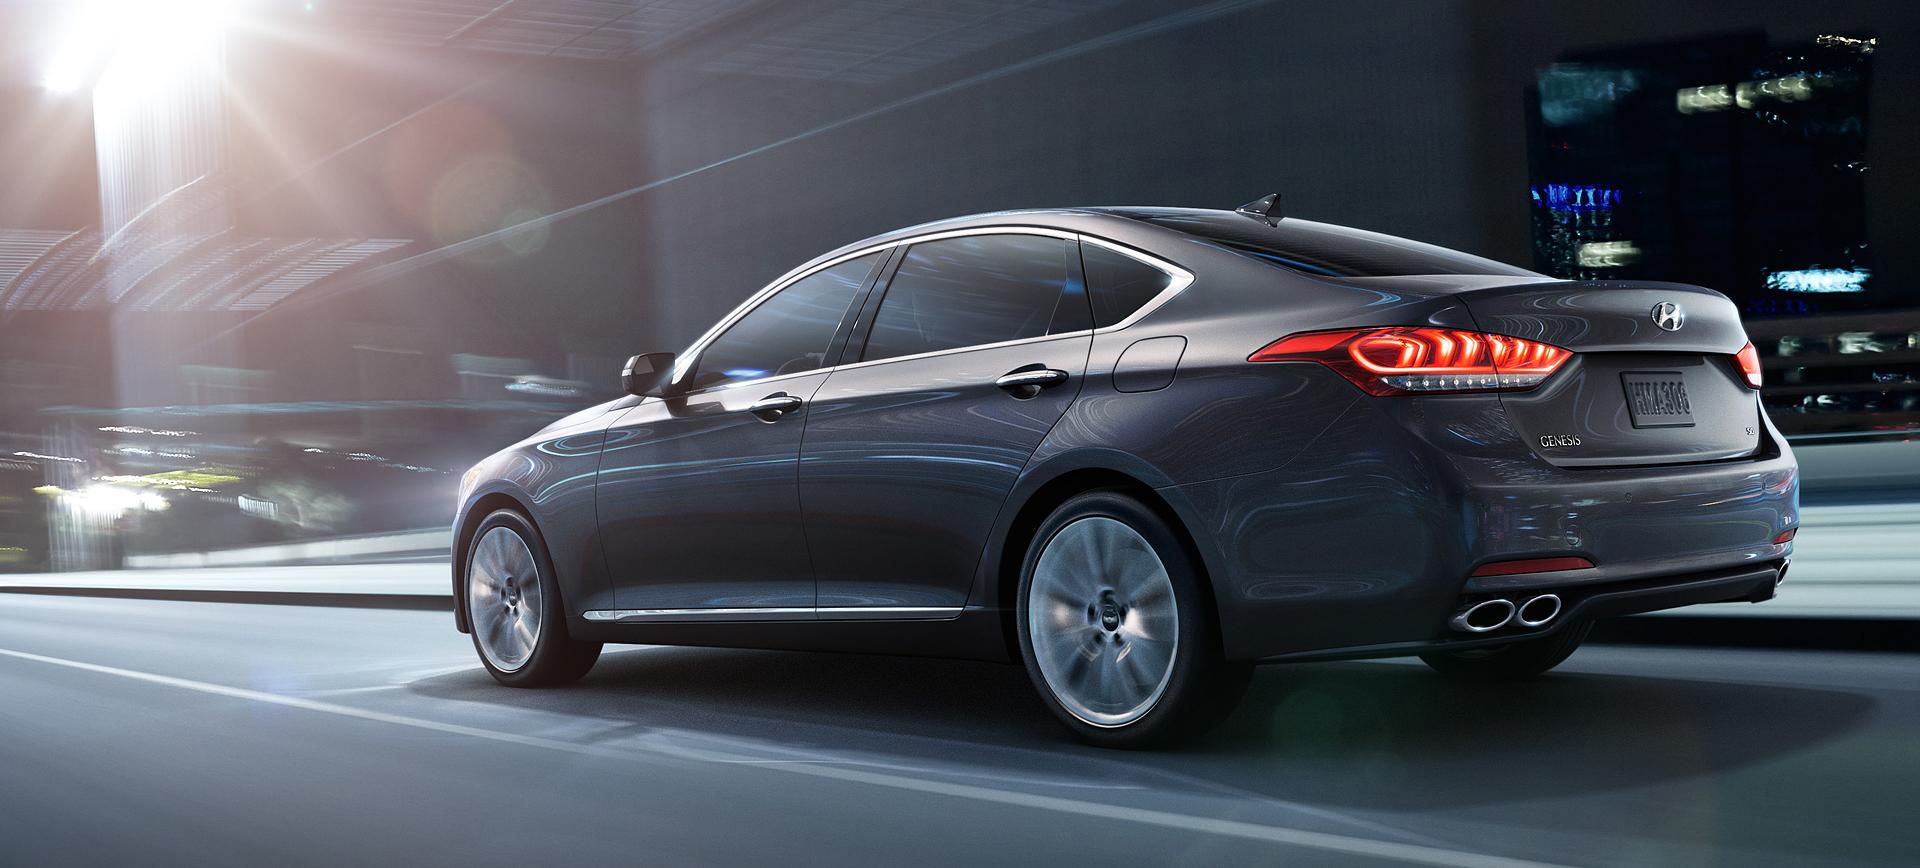 New Hyundai Genesis Lease Offers Norman Ok Automax Hyundai